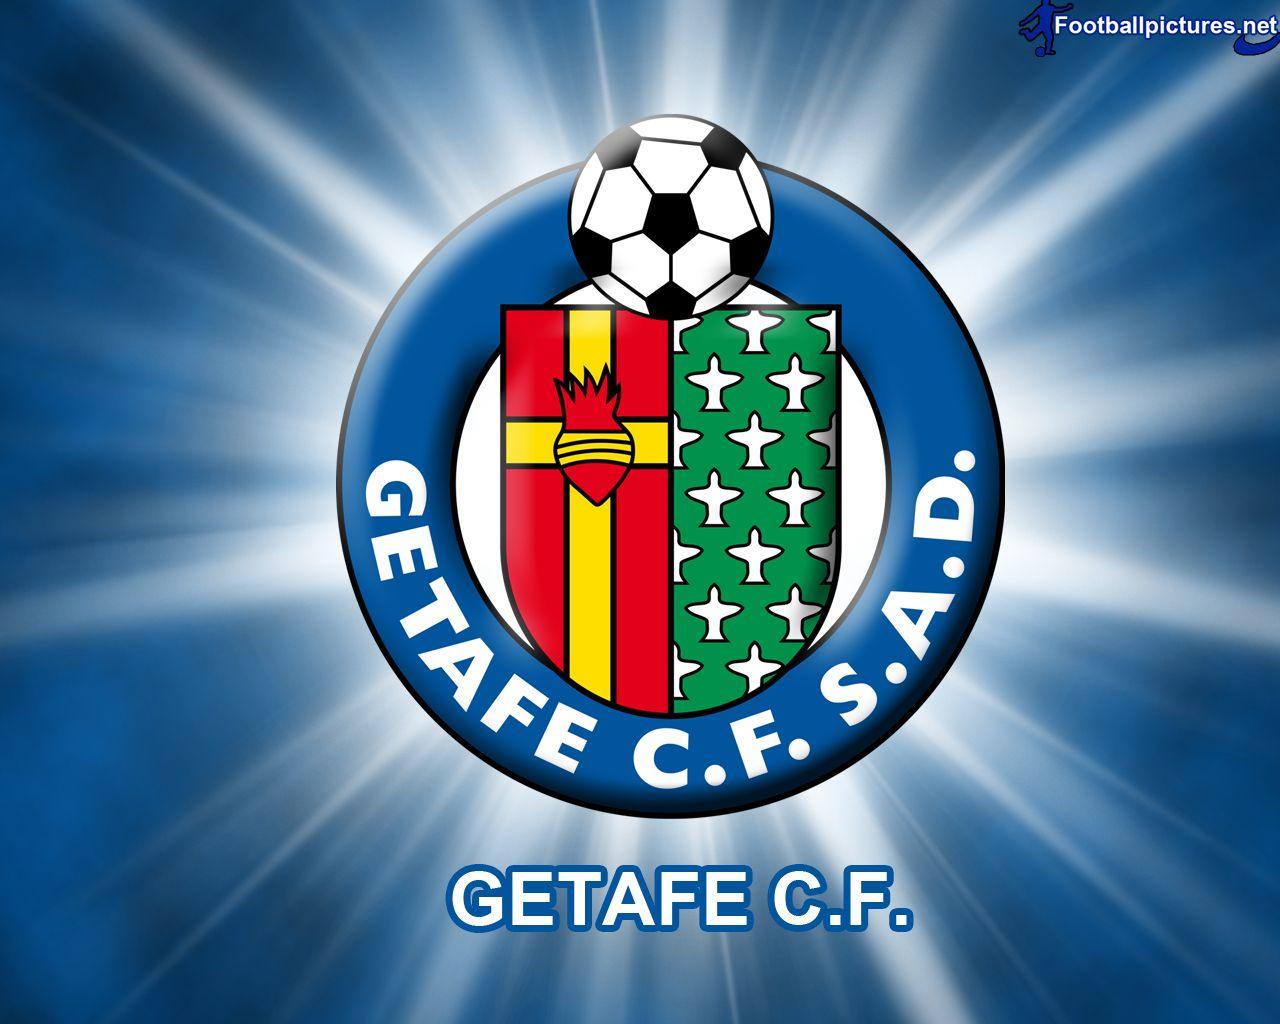 31 Ll Getafe Cf Ideas Santiago Bernabéu Stadium Villarreal Cf Spanish La Liga